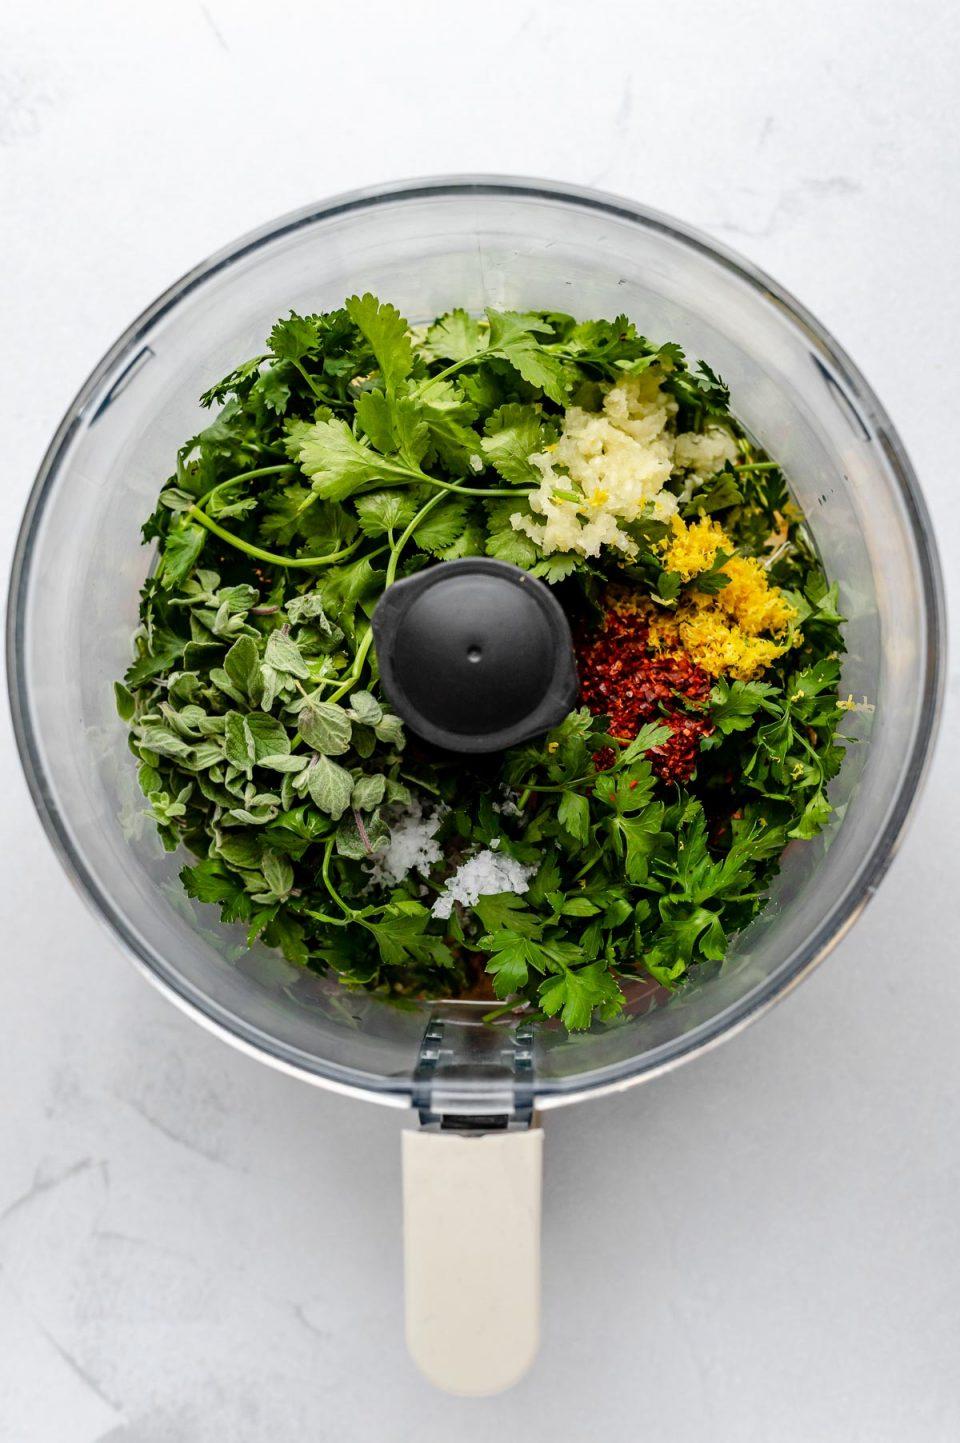 Easy Chimichurri sauce recipe ingredients fill up a food processor bowl: cilantro, parsley, oregano, garlic, lemon juice & zest, olive oil, red wine vinegar, crushed red pepper flakes, and kosher salt.